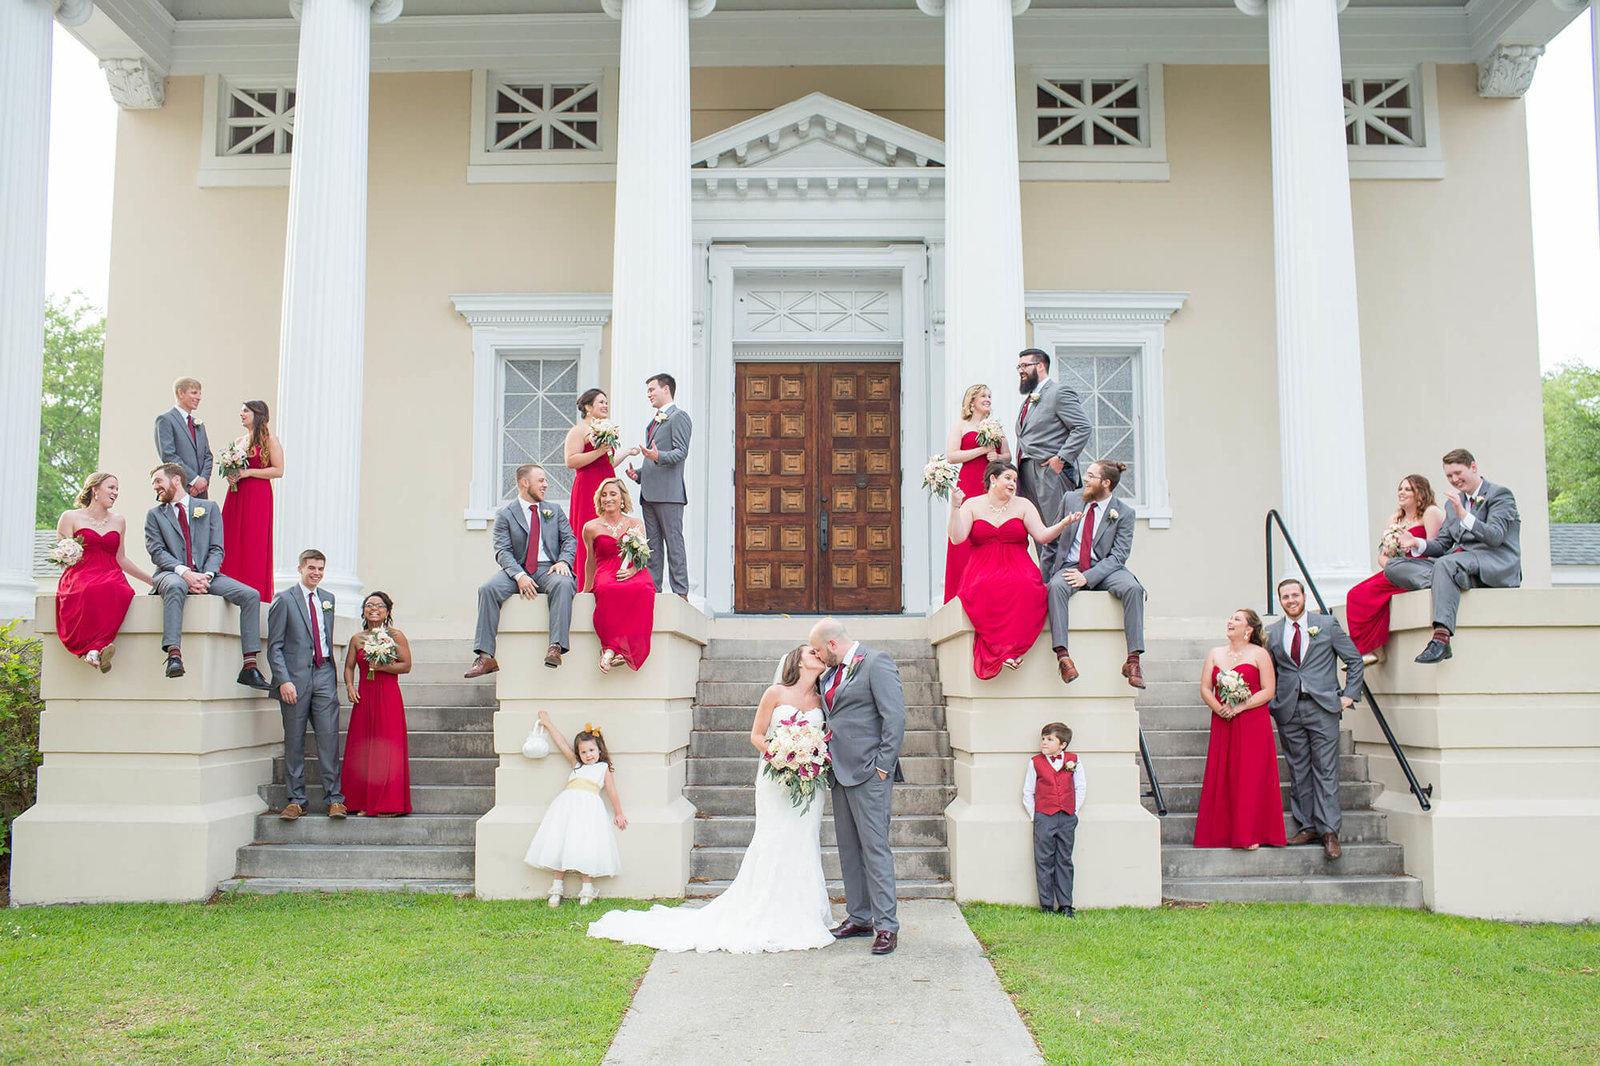 VAUSE-Wedding_SC-Wedding-Photographer_Jessica-Hunt-Photography_2016-26